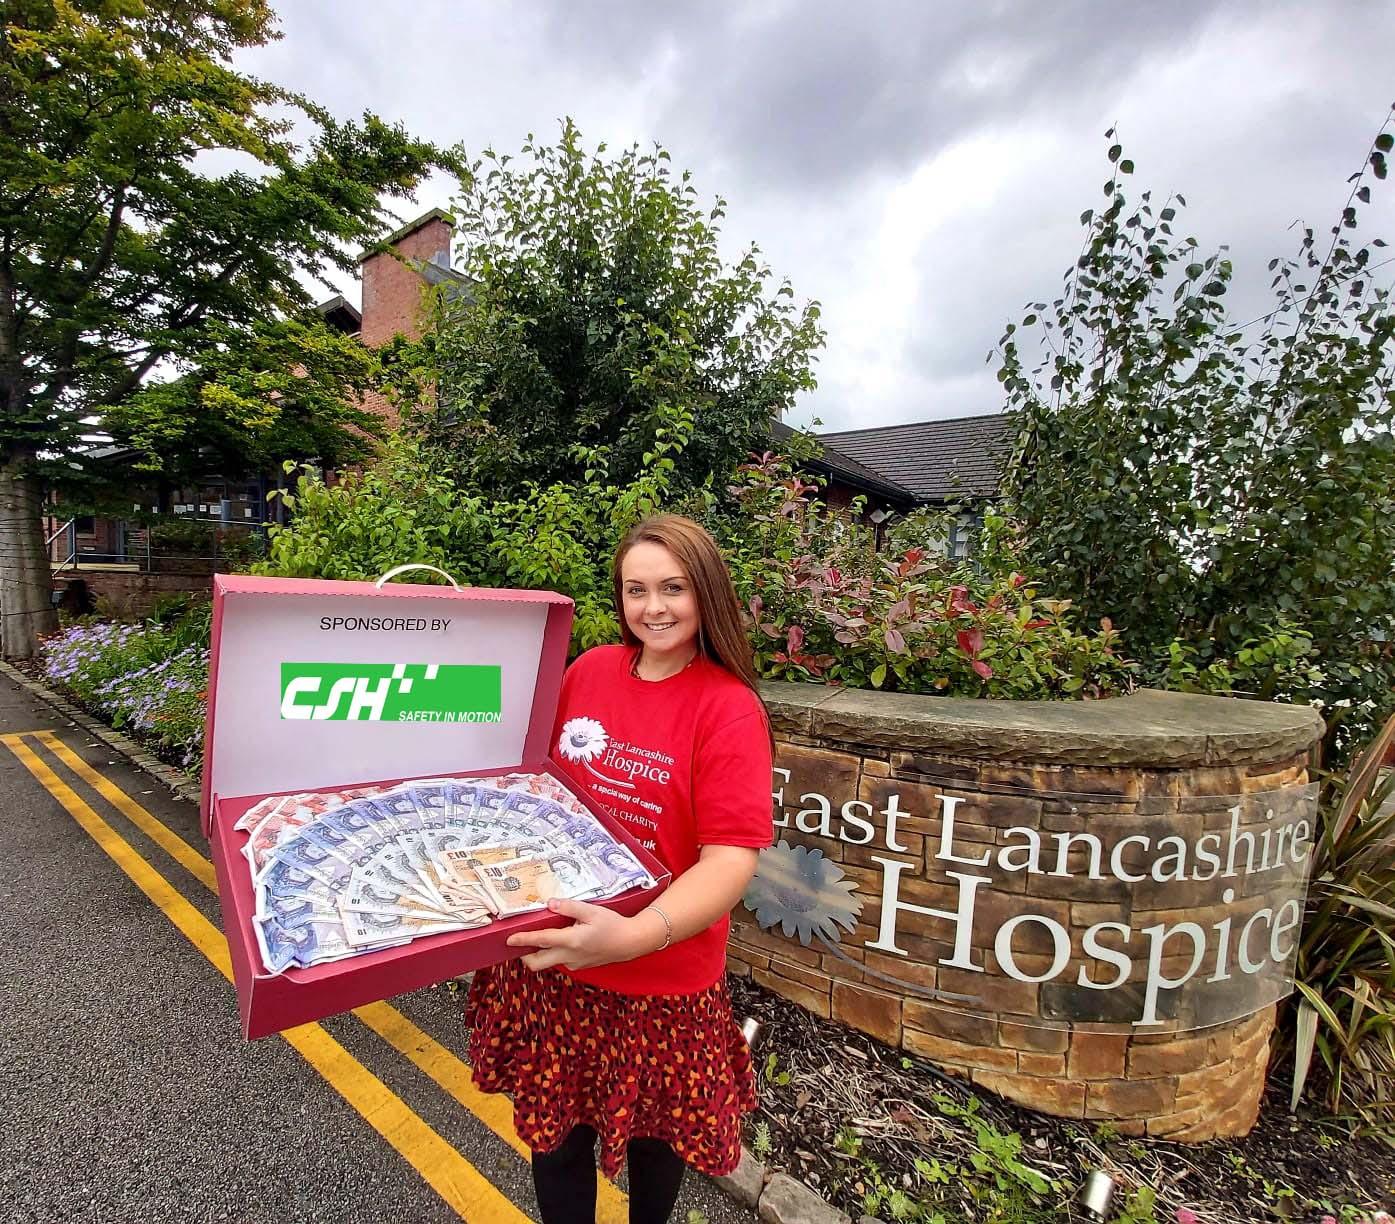 East Lancashire Hospice Autumn Raffle